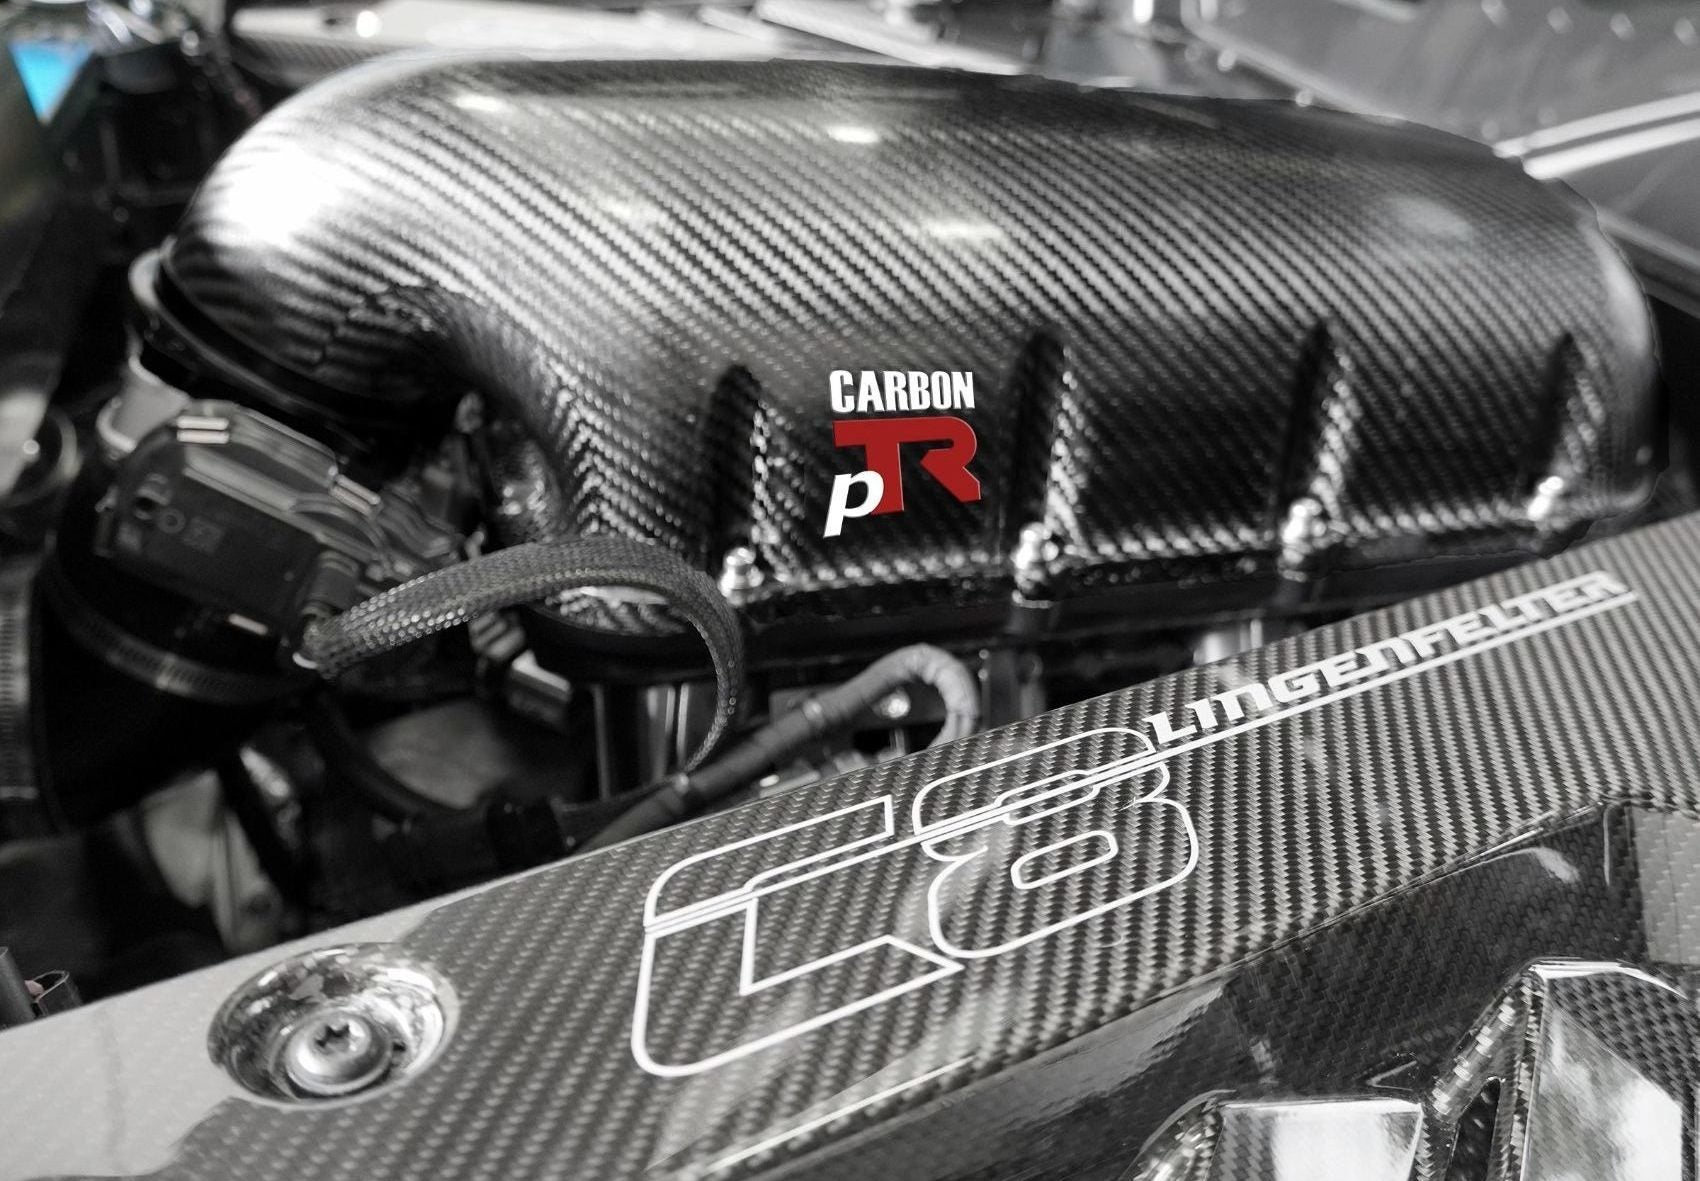 Lingenfelter Launches Performance Design pTR Carbon Fiber Intake Manifold System for C8 LT2 Corvettes